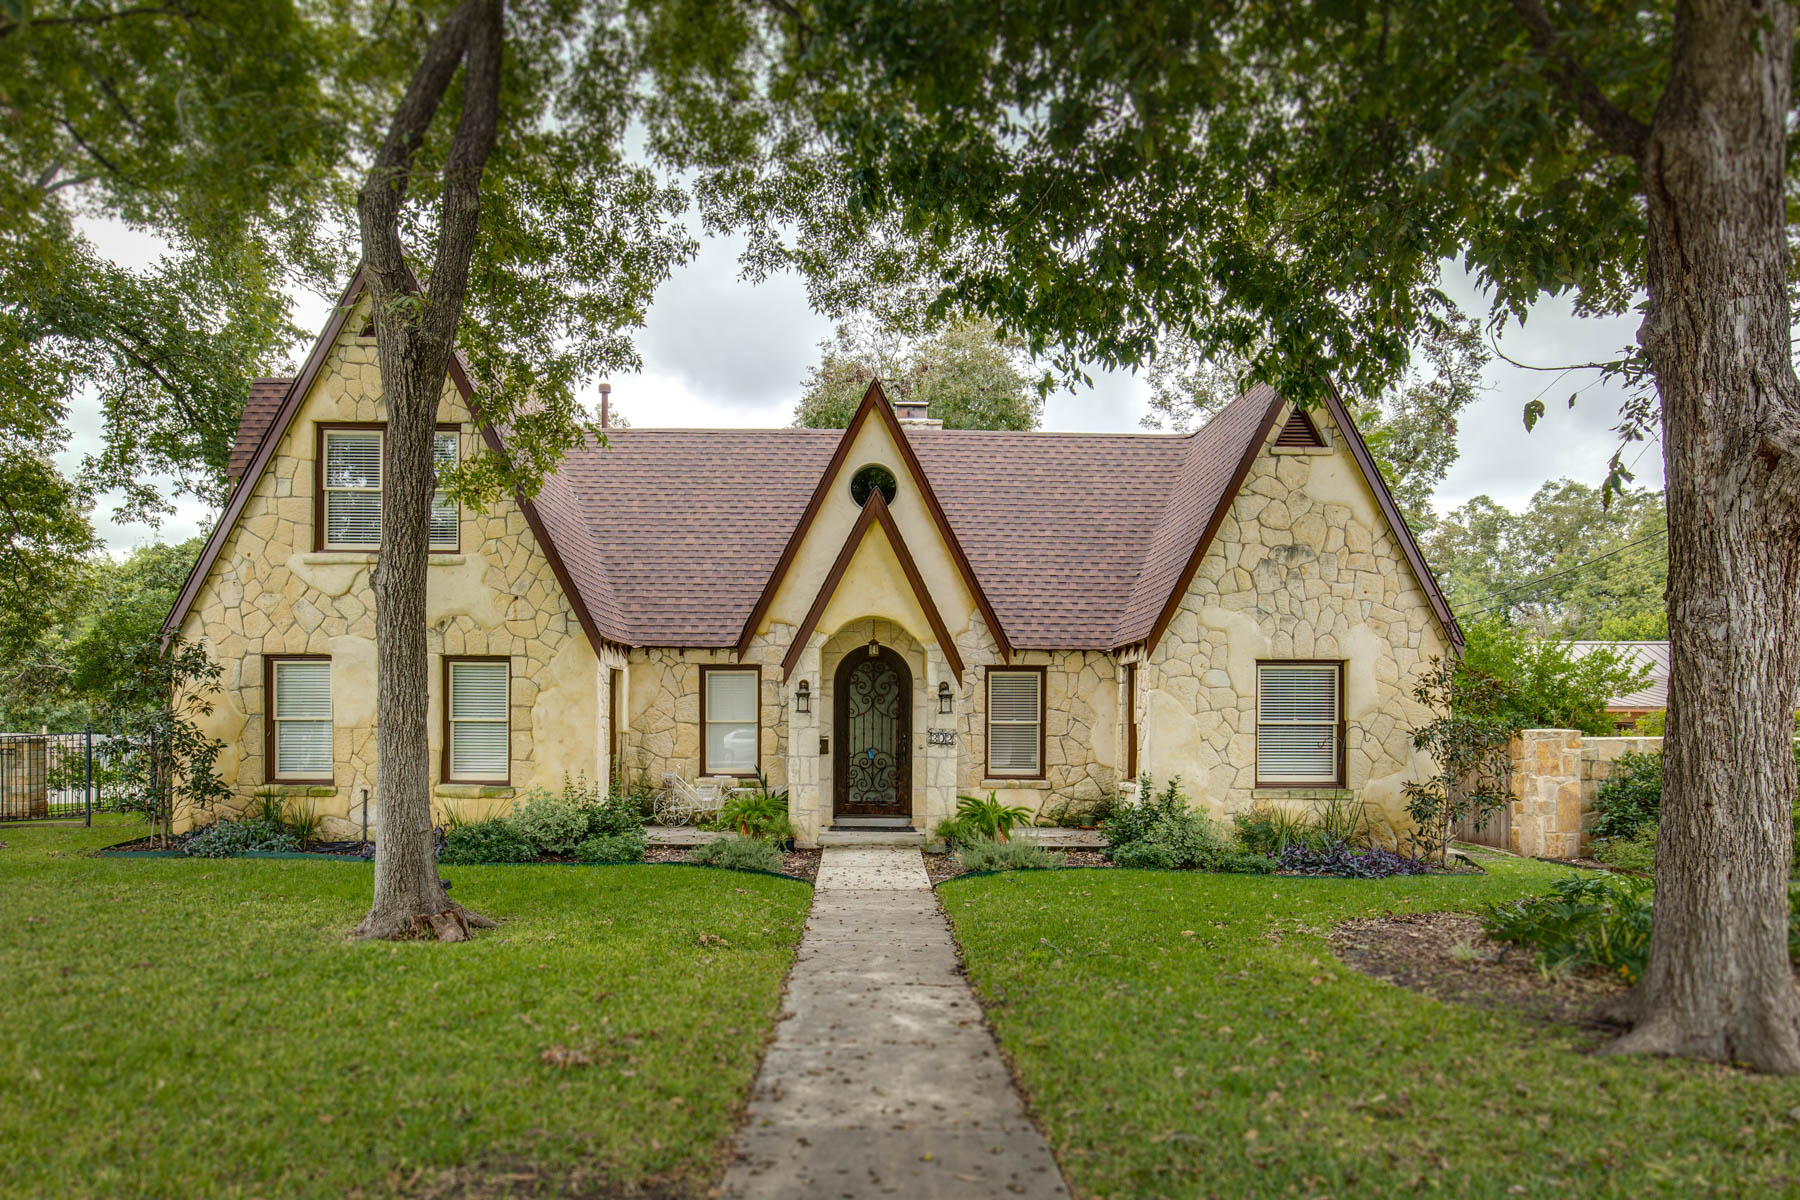 独户住宅 为 销售 在 Lovely Tudor Home in Alamo Heights 302 College Blvd Alamo Heights, San Antonio, 得克萨斯州 78209 美国